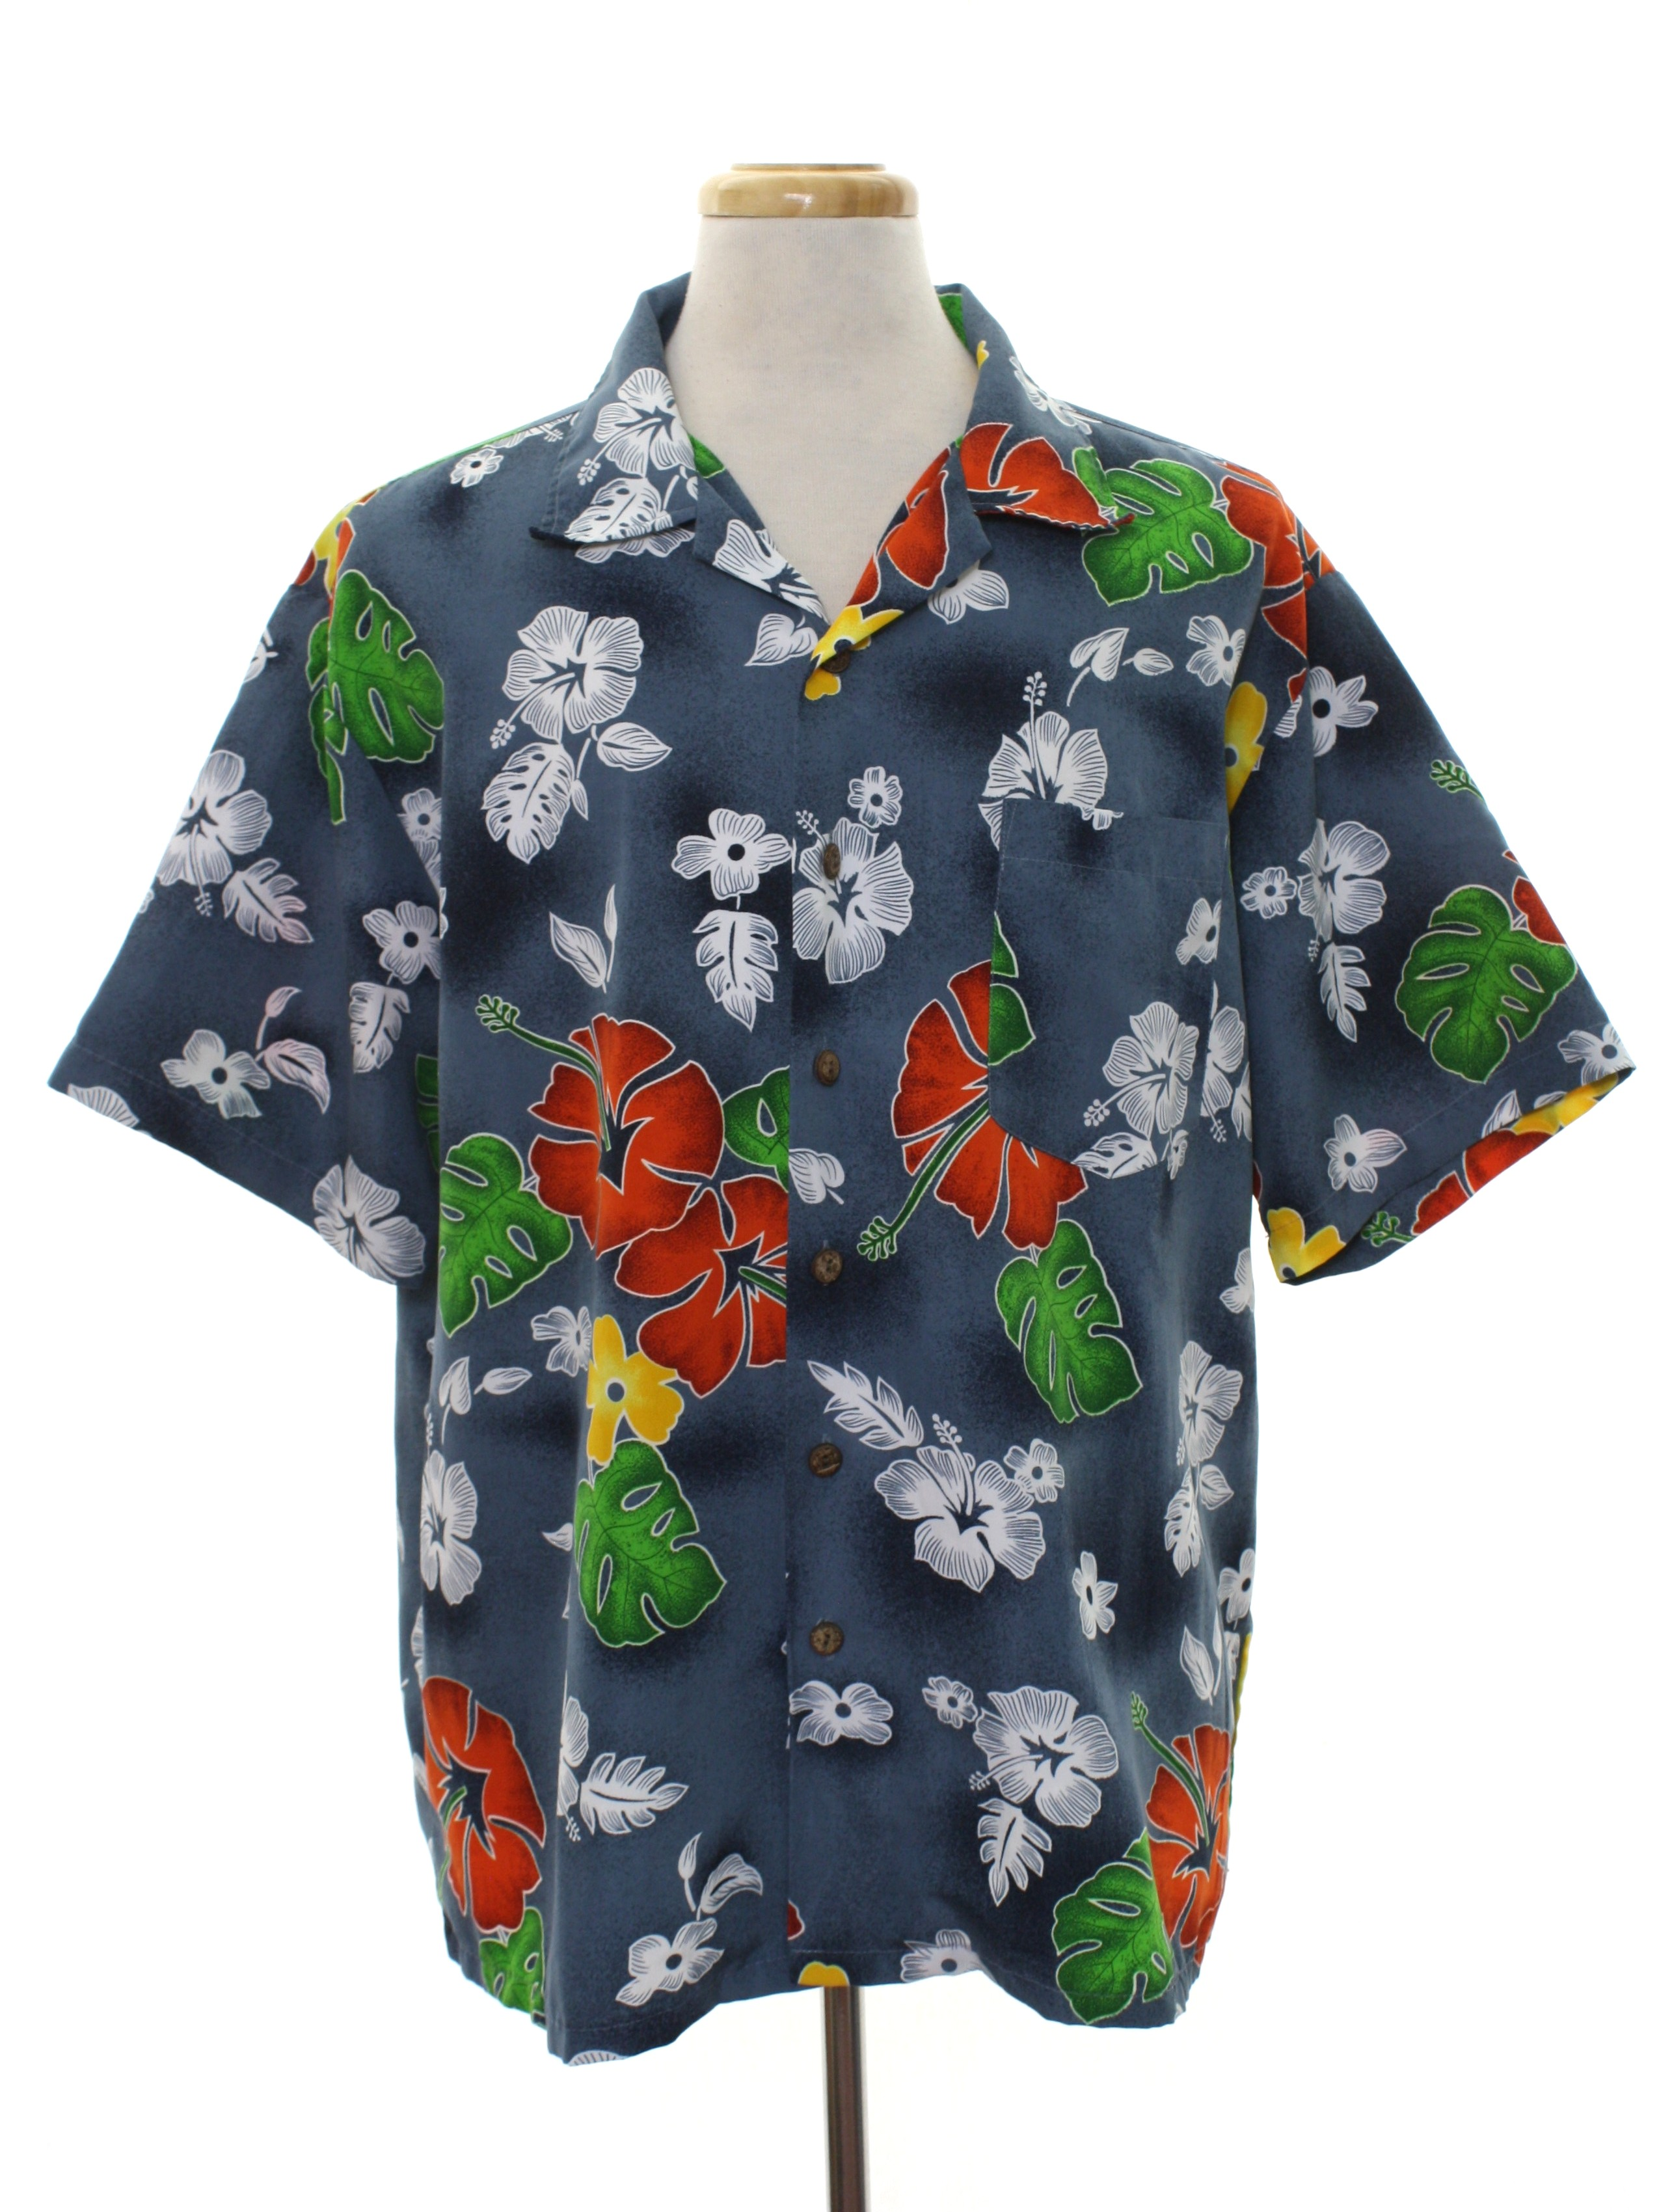 dating hawaiian shirts Hawaiian shirts and dresses women hawaiian shirt collection 100% cotton contoured-fit and shorter sleeves made in hawaii size chart for women aloha shirts.